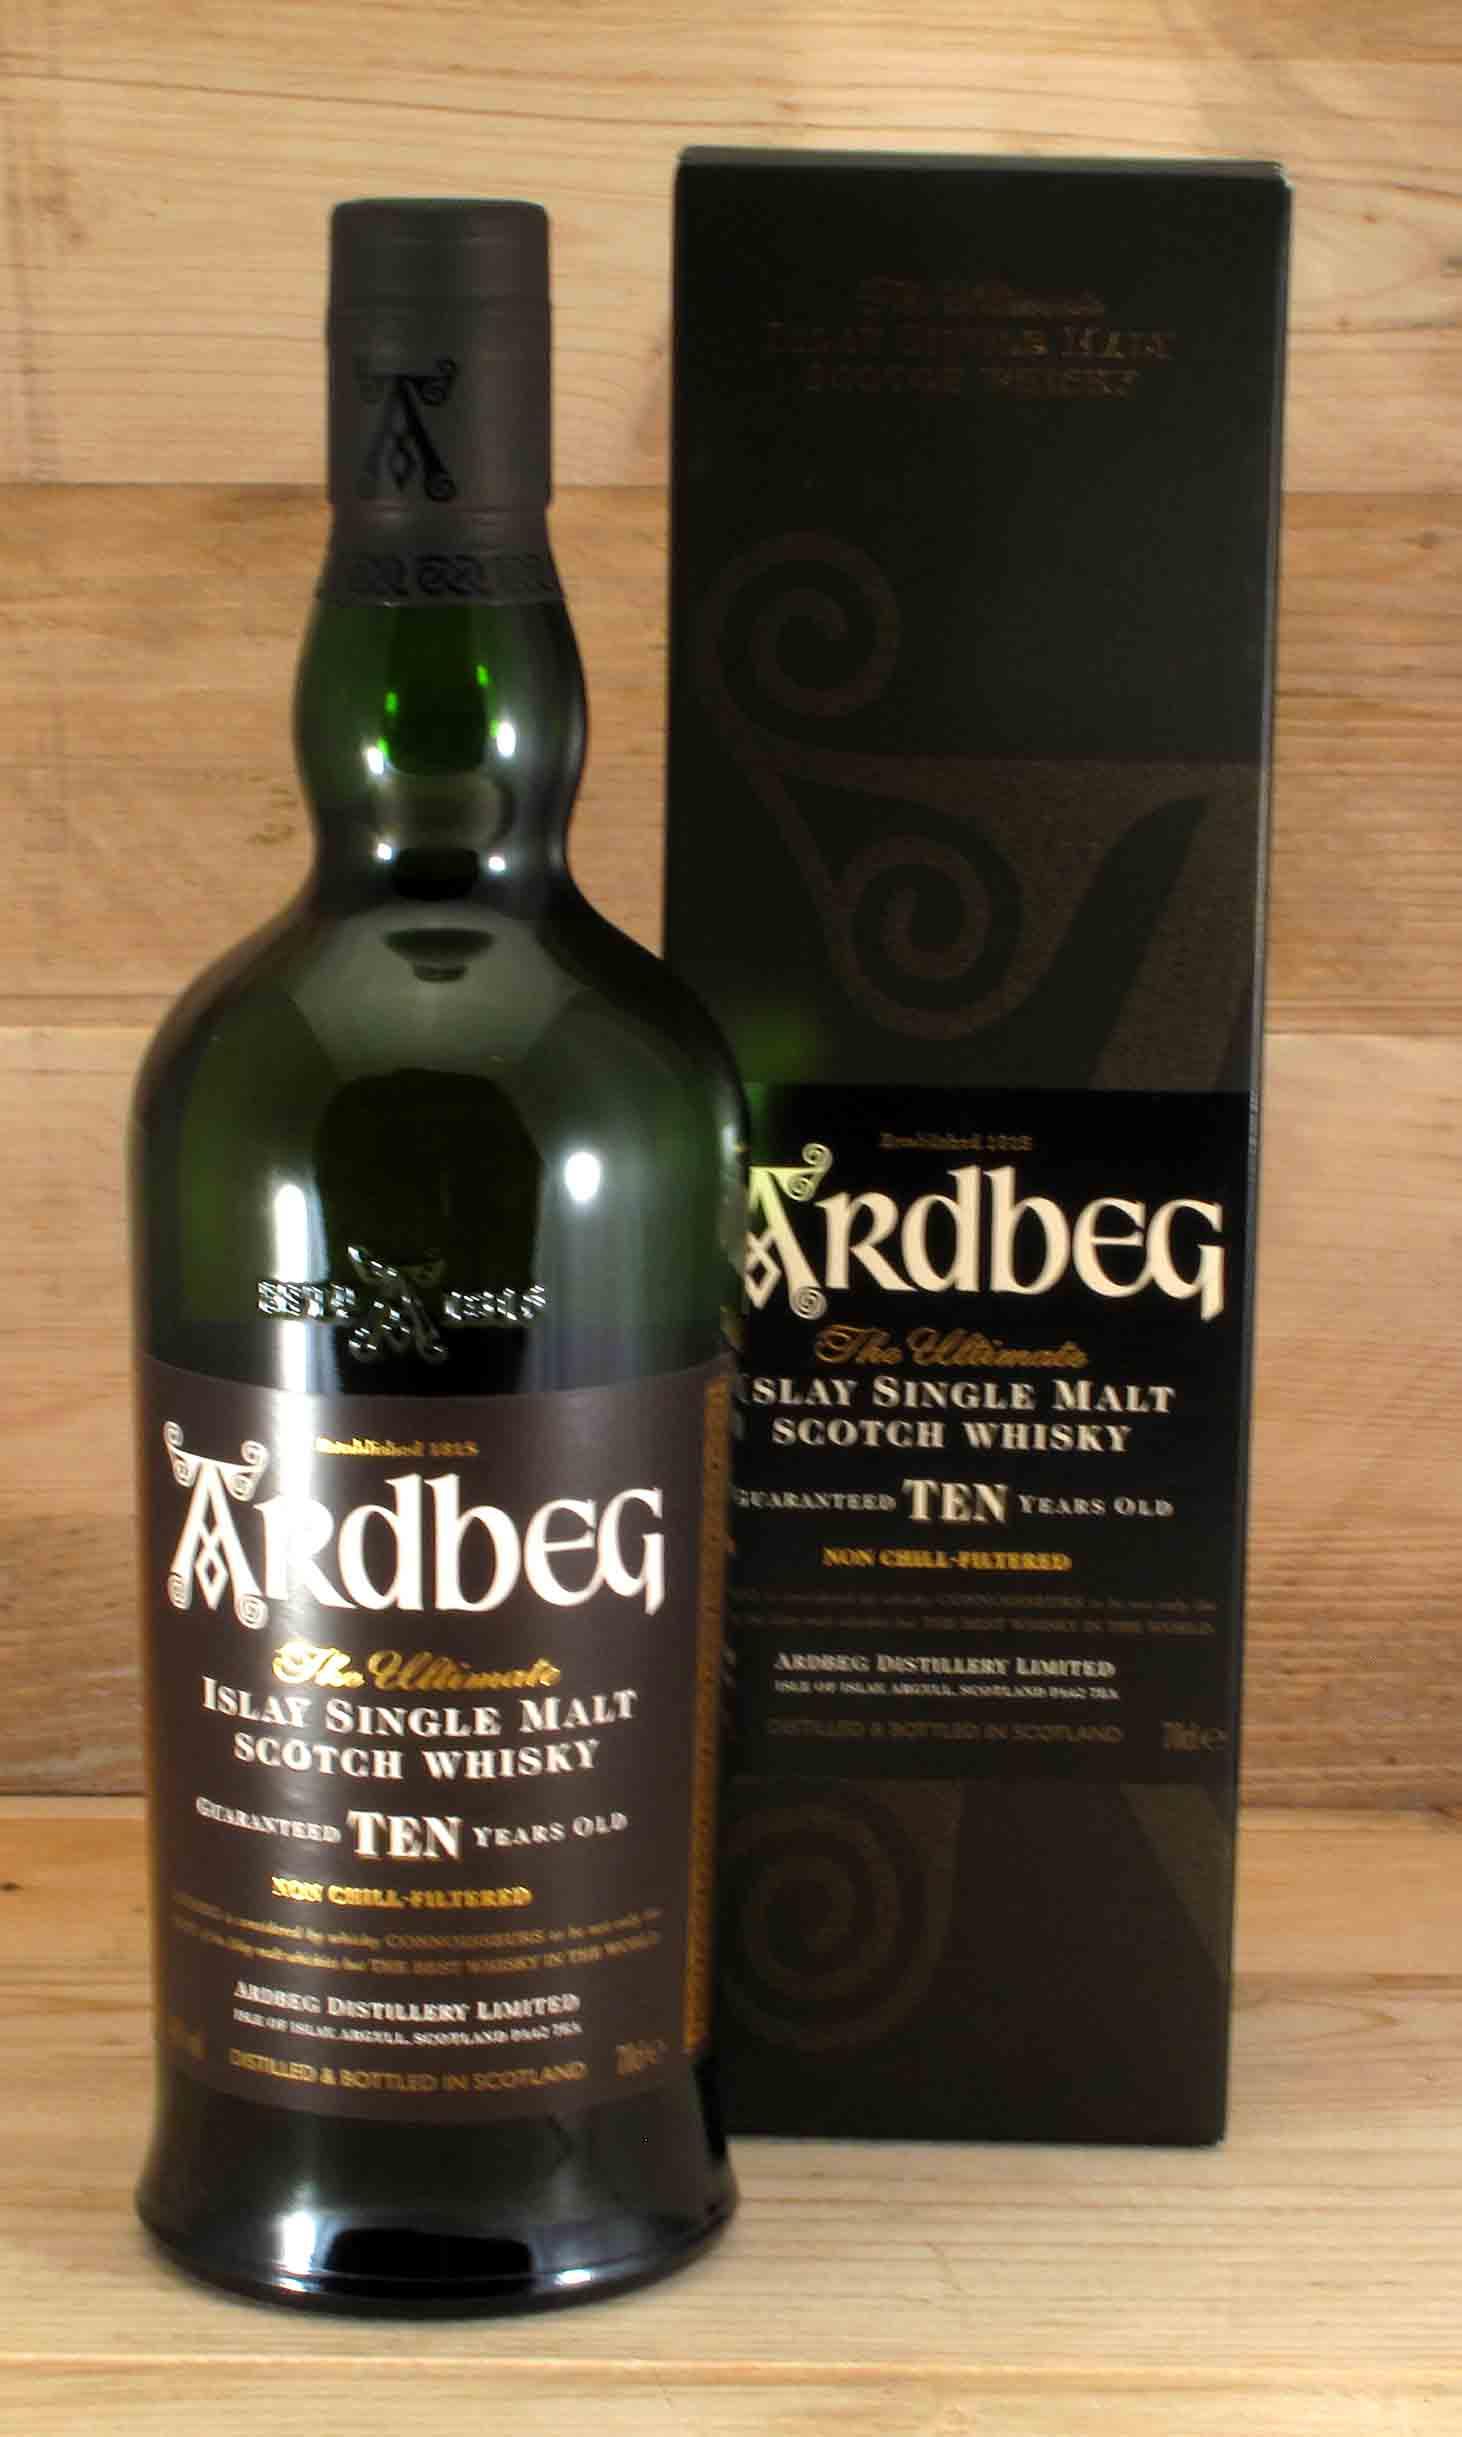 Ardbeg 10 Islay Single Malt Scotch Whisky | viel fein [feel fine]